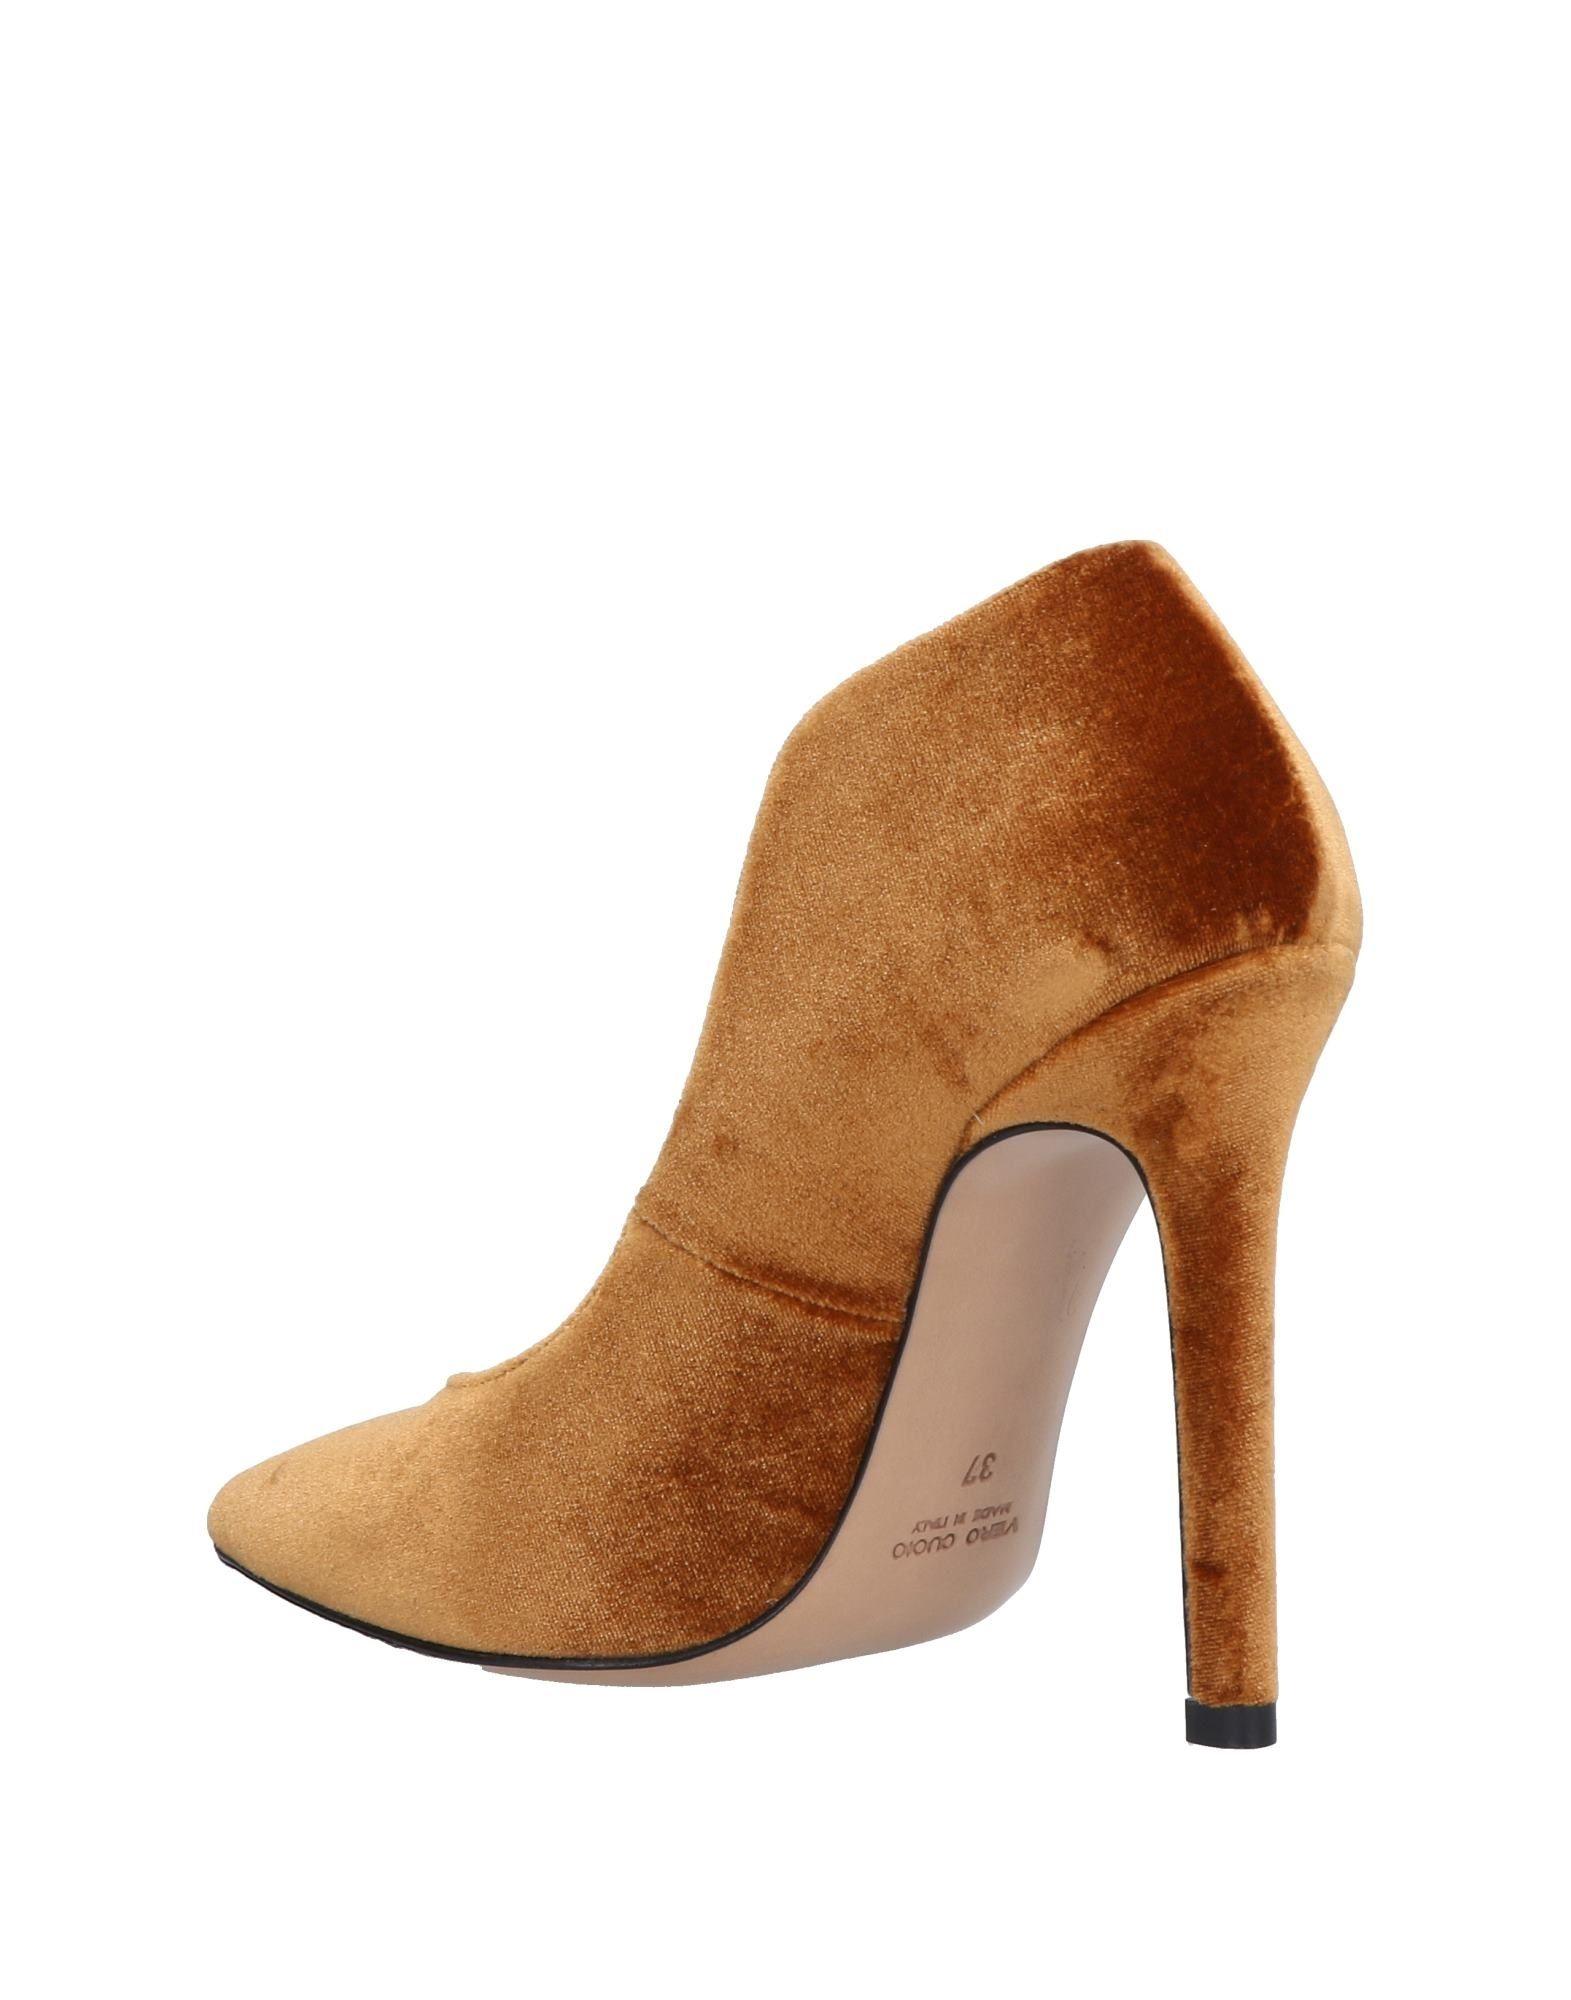 Islo Isabella Lorusso Pumps Qualität Damen  11471748IU Gute Qualität Pumps beliebte Schuhe ba530b